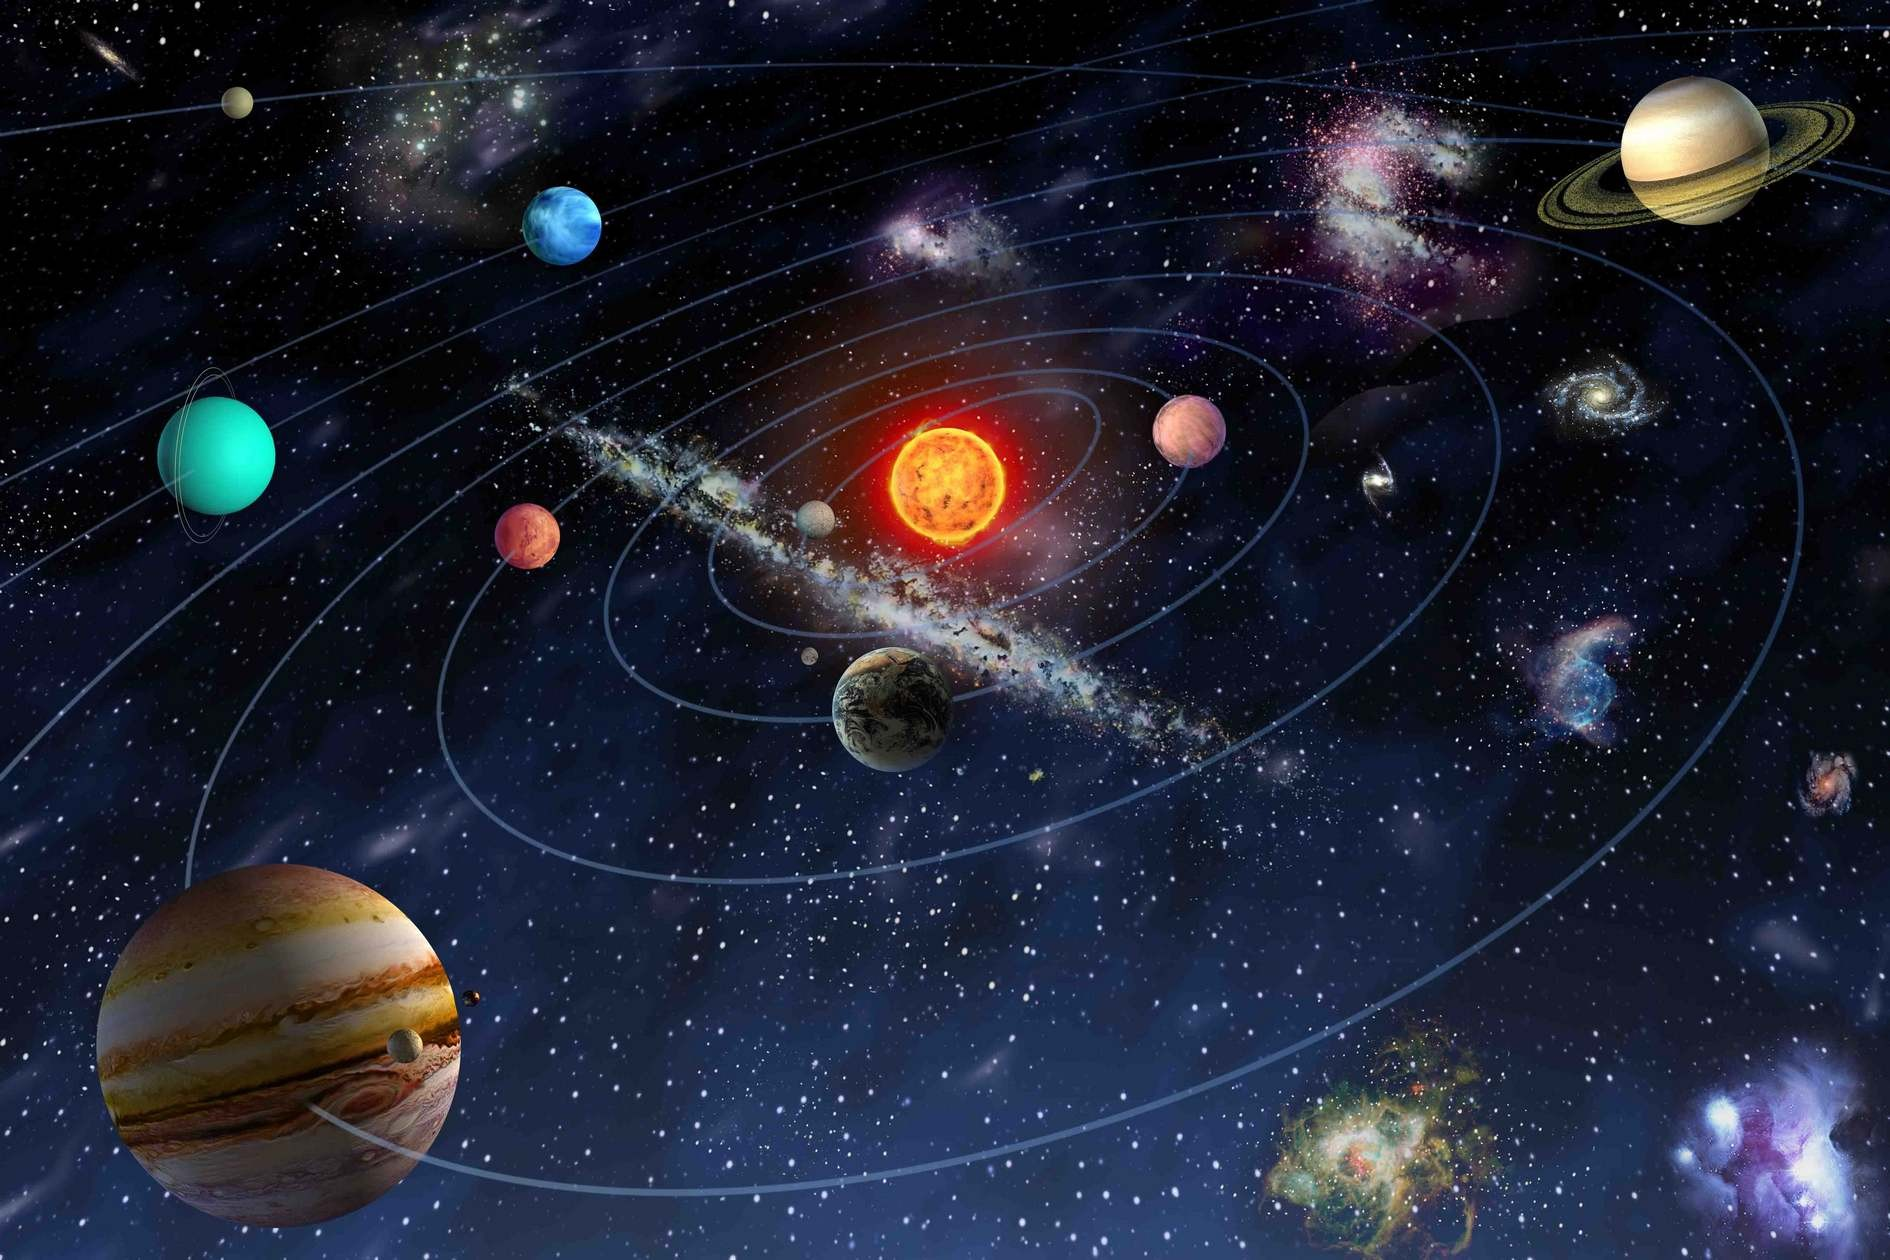 картинки космоса и планет презентации известного шоумена телеведущего